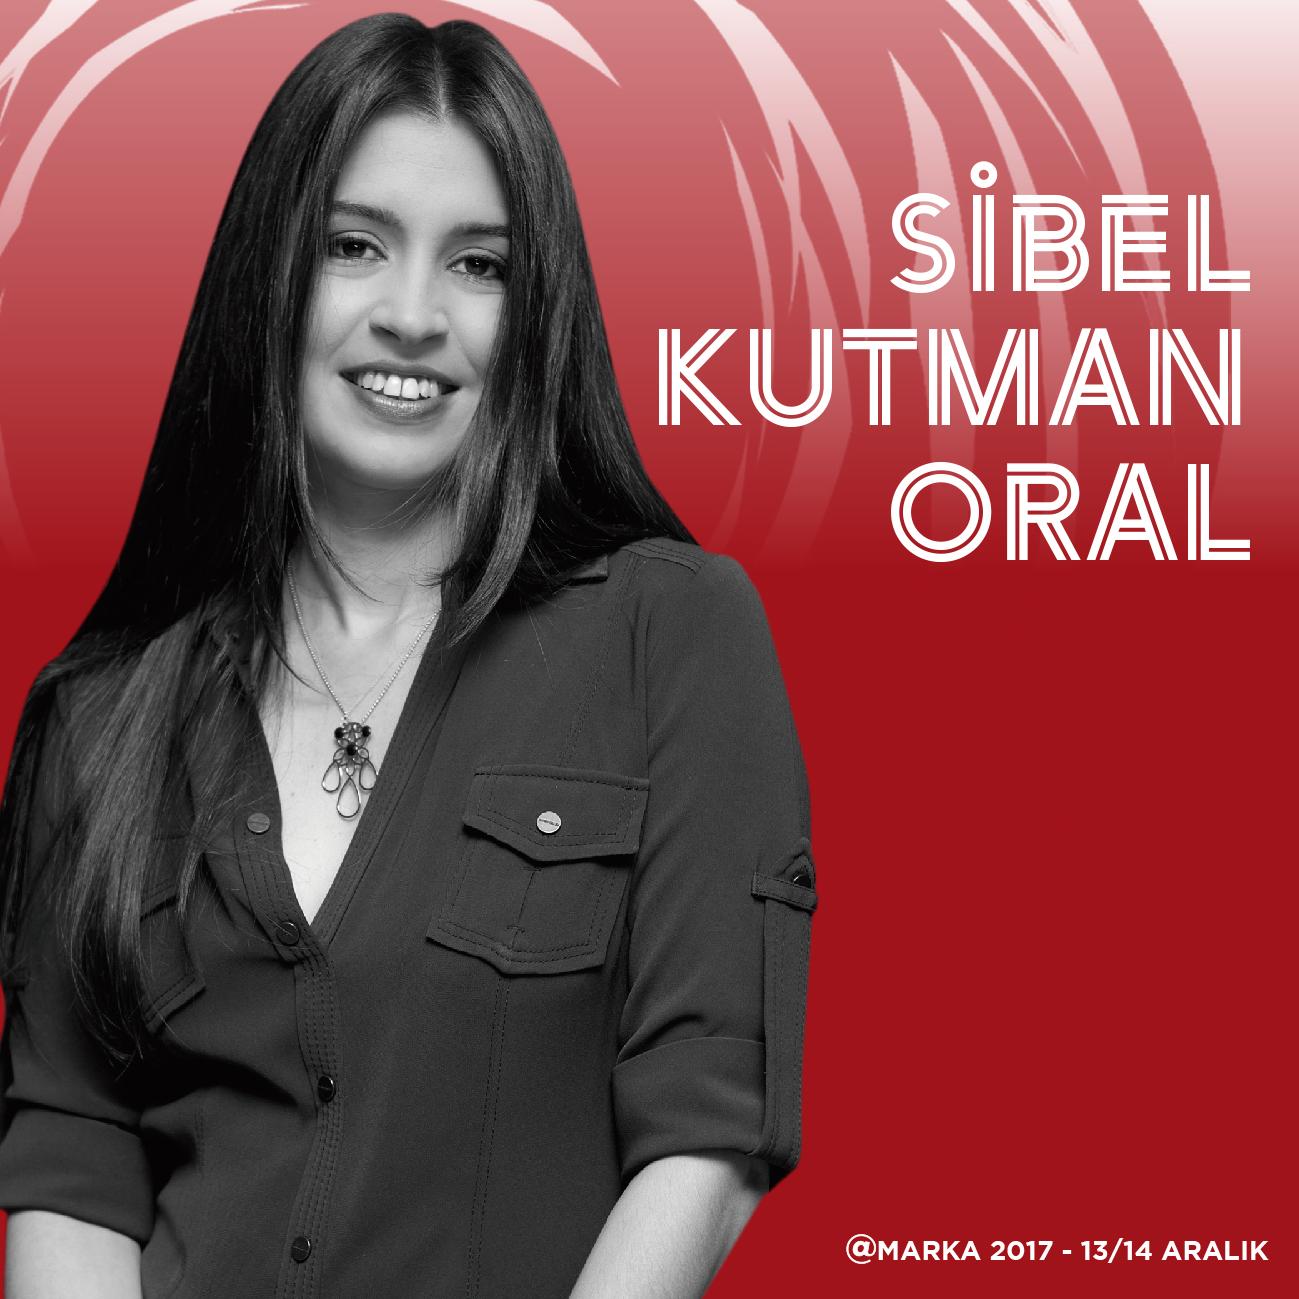 SIBEL KUTMAN ORAL